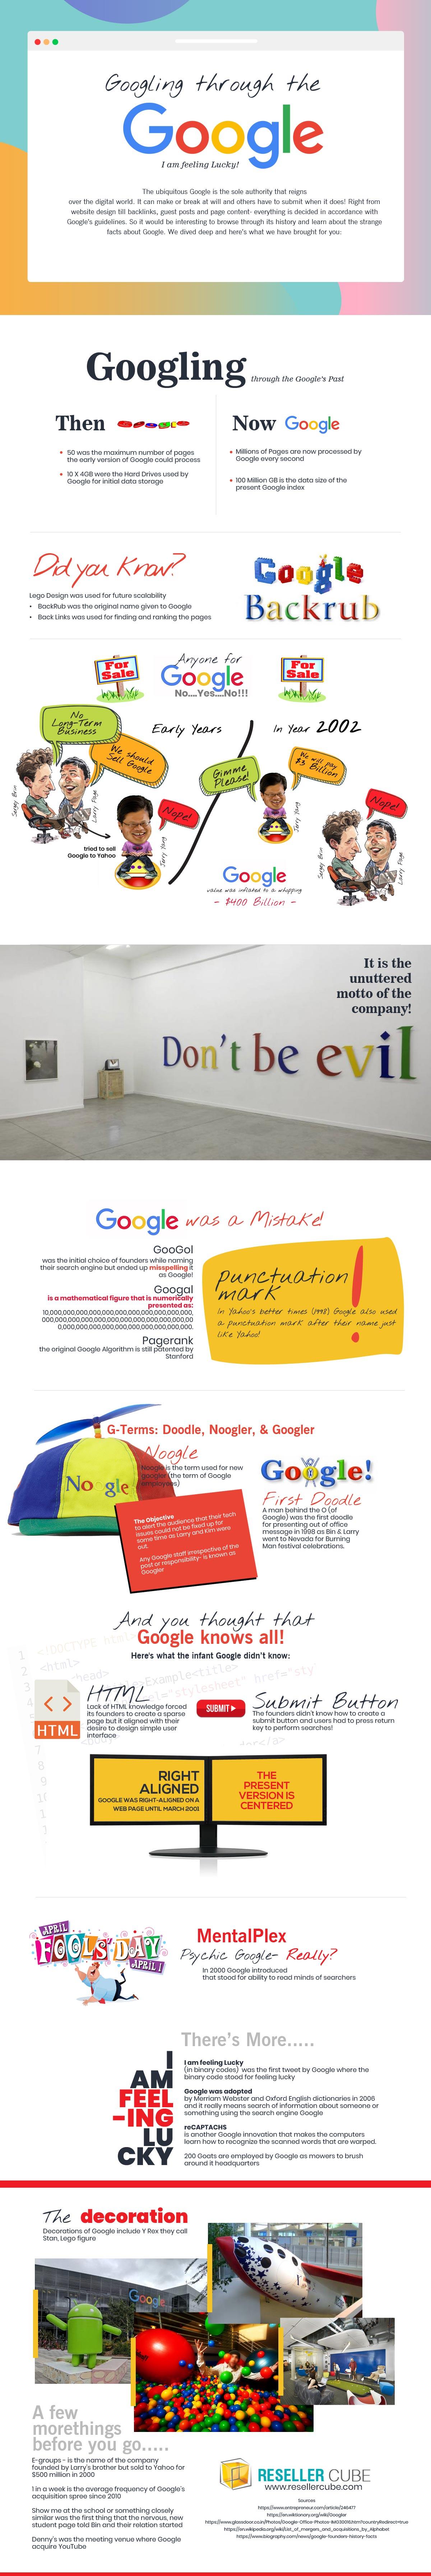 Googling Google [Infographic]